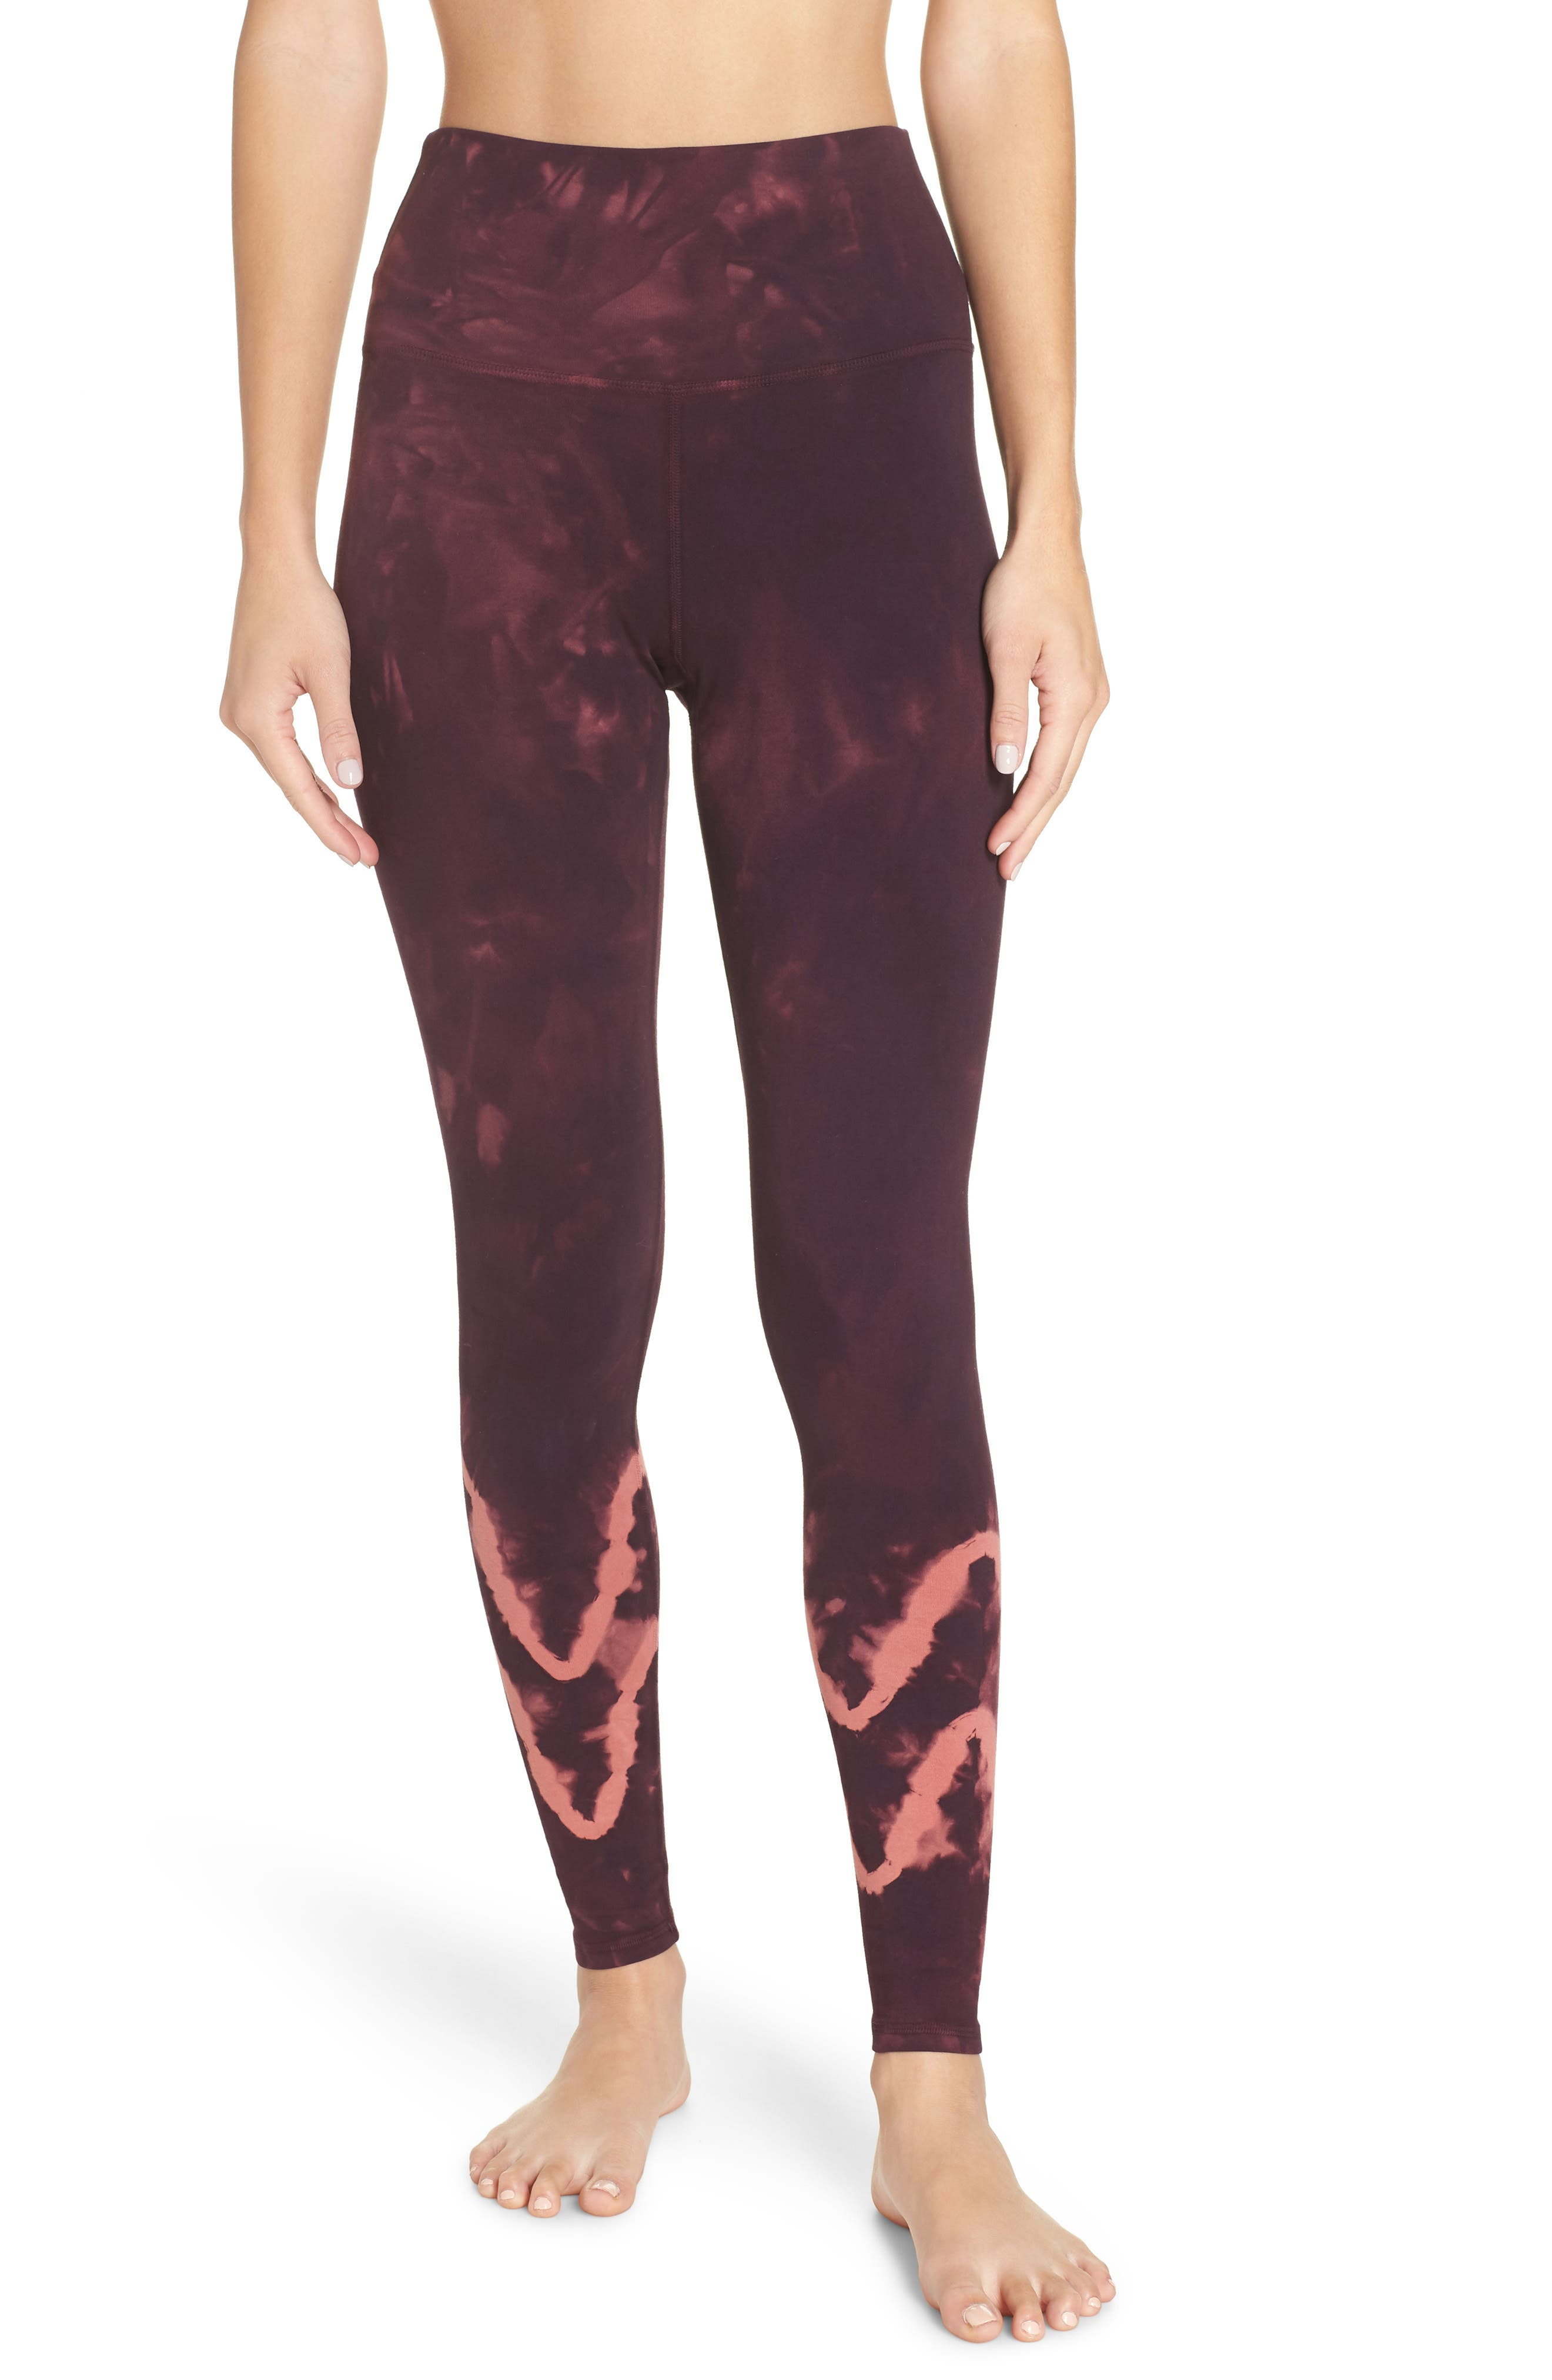 Electric & Rose Sunset Tie Dye Leggings